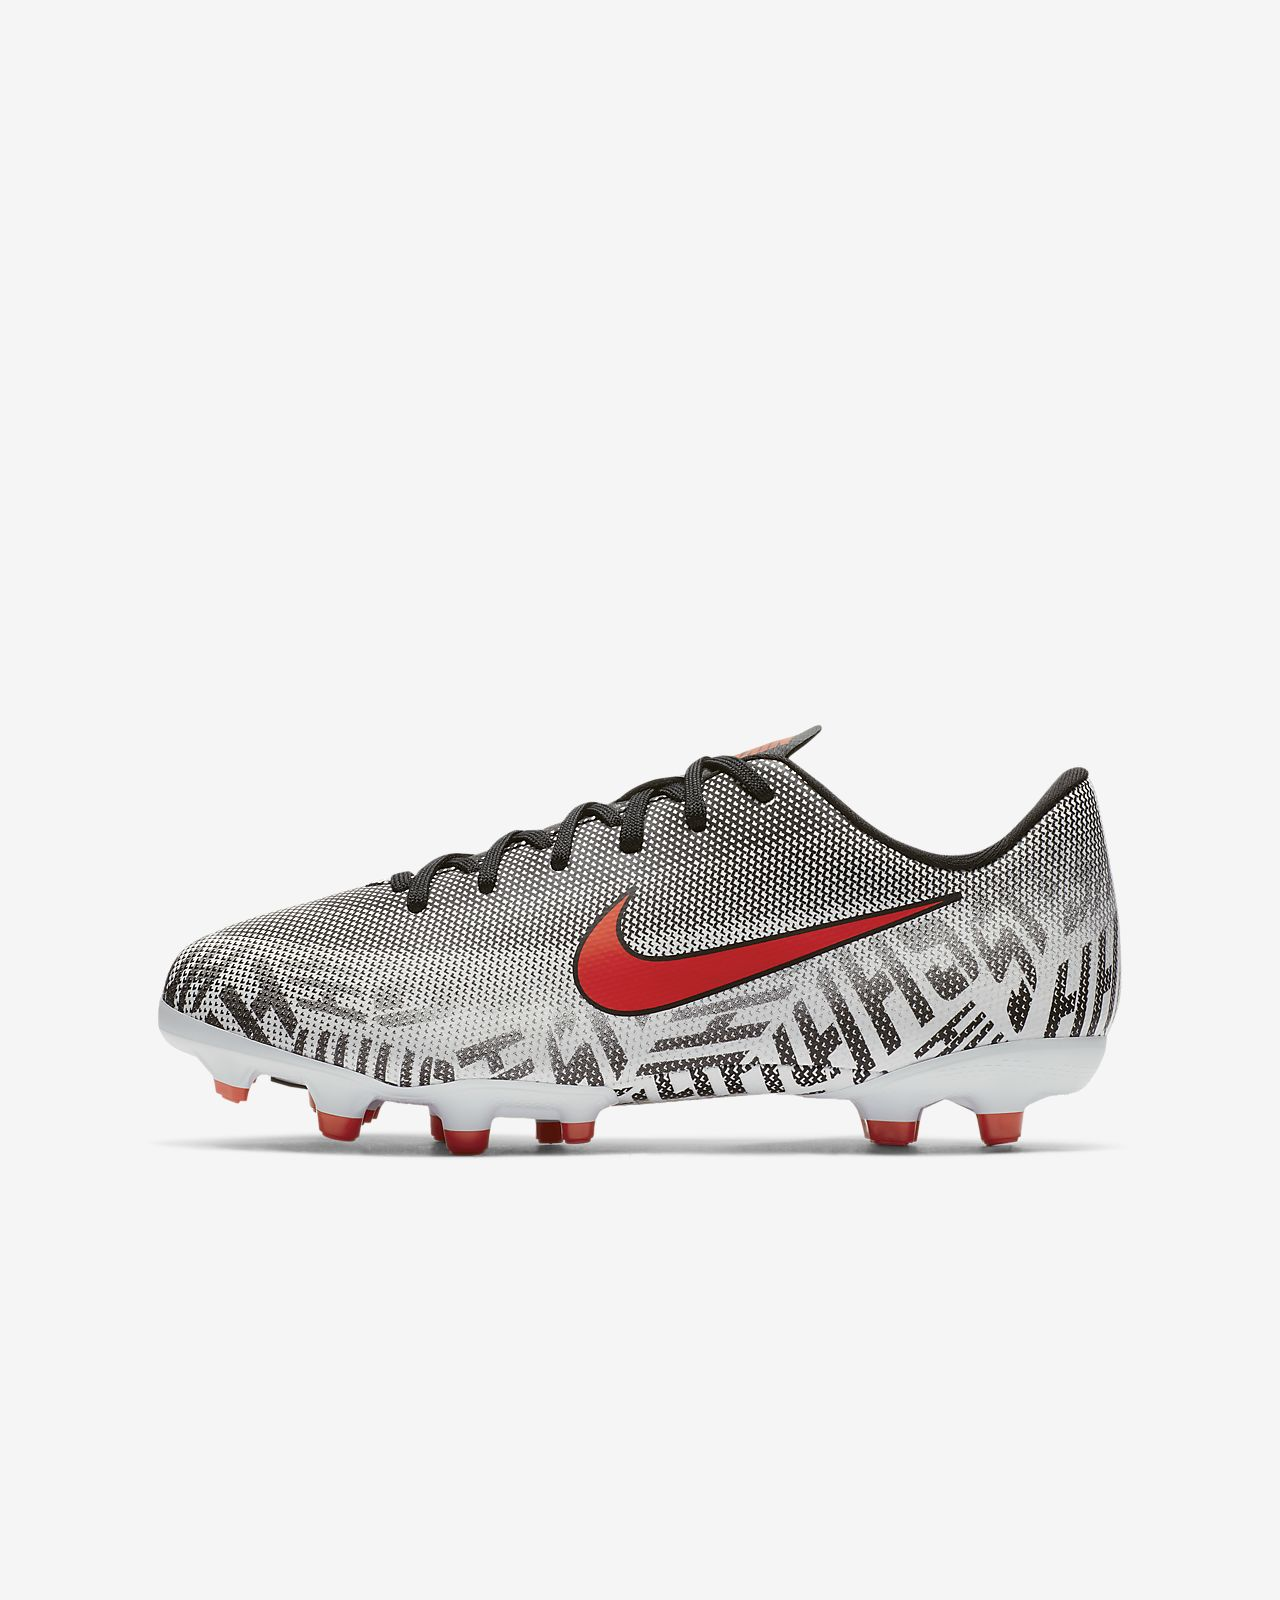 Calzado de fútbol para múltiples superficies para niños talla pequeña/grande Nike Jr. Mercurial Vapor XII Academy Neymar Jr